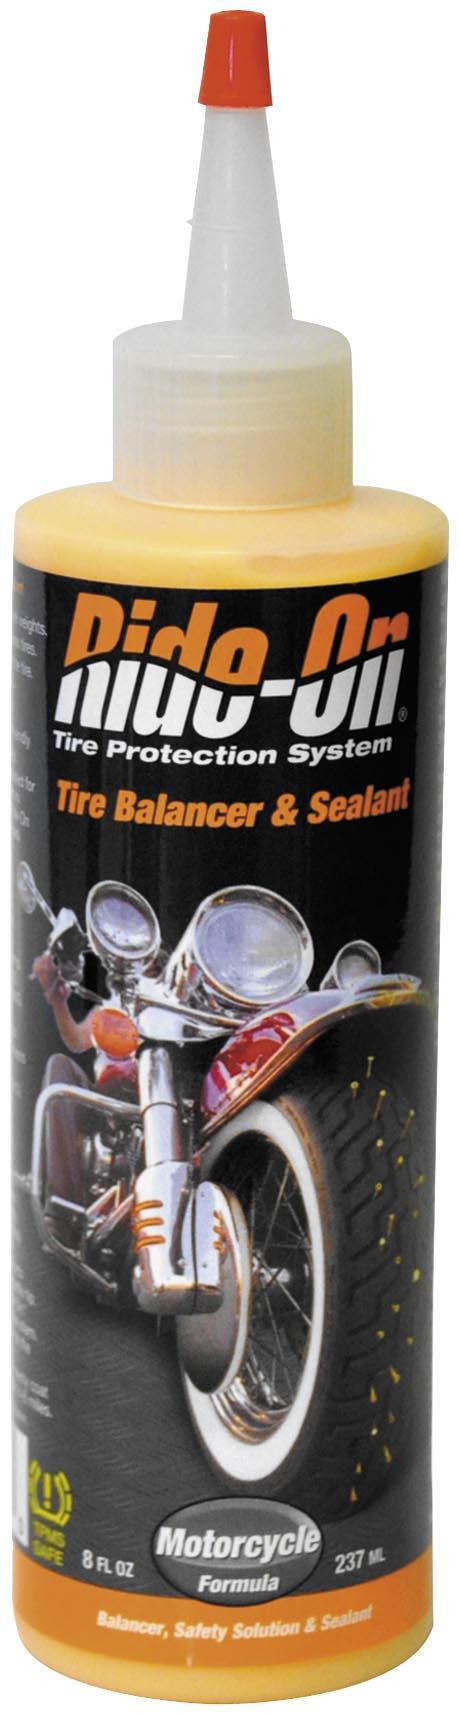 Tire Balancer and Sealant